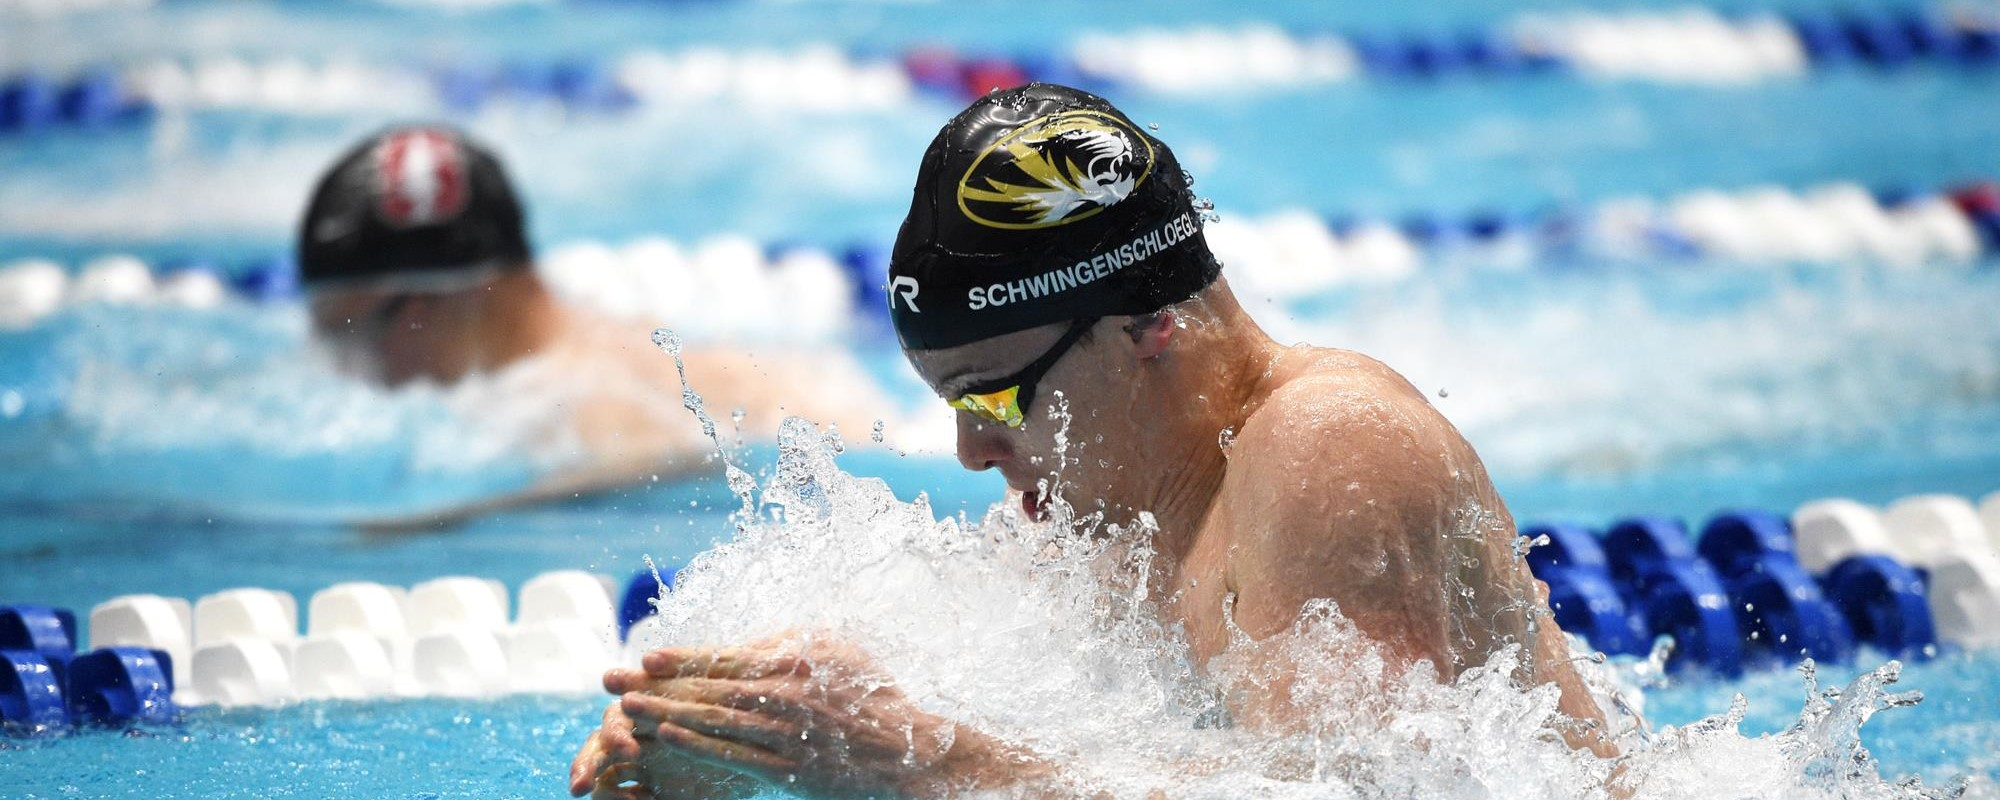 Fabian Schwingenschlögl swims for mizzou